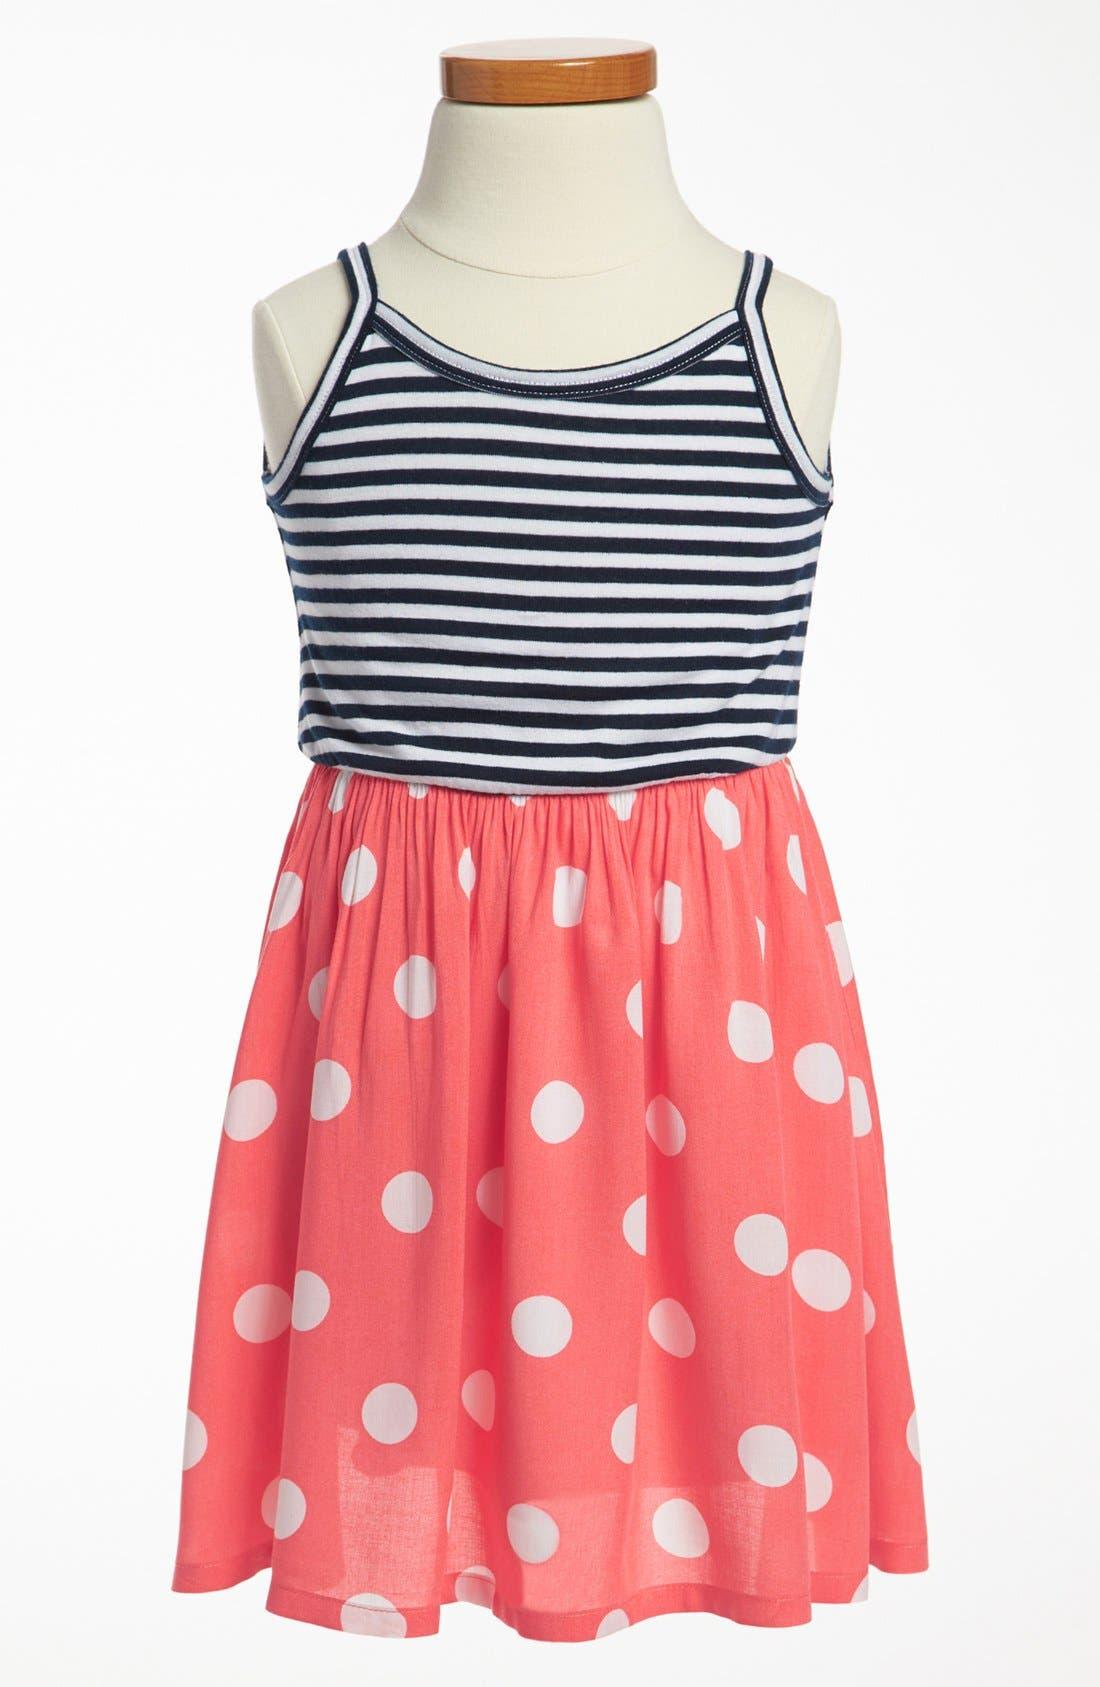 Main Image - Splendid 'Pool Party' Dress (Little Girls)